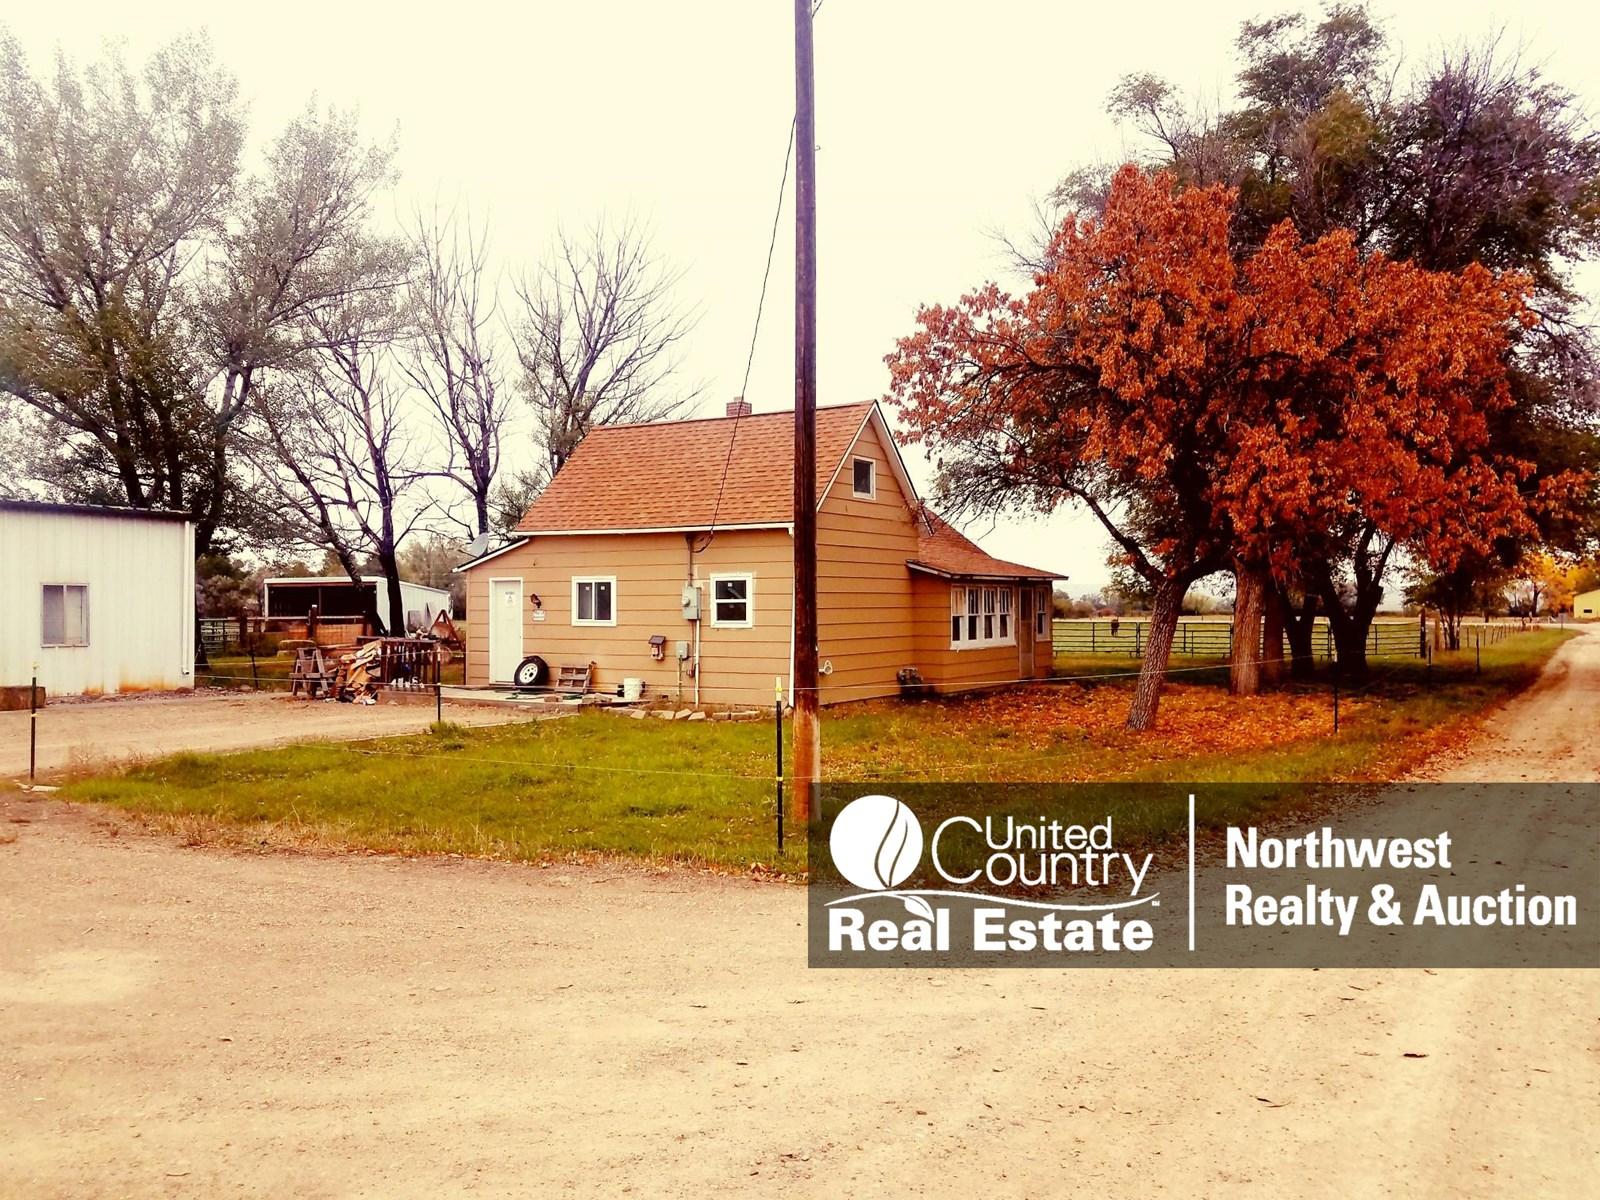 Horse Property, Acreage, Milk River Access, 3 Bedroom & Shop